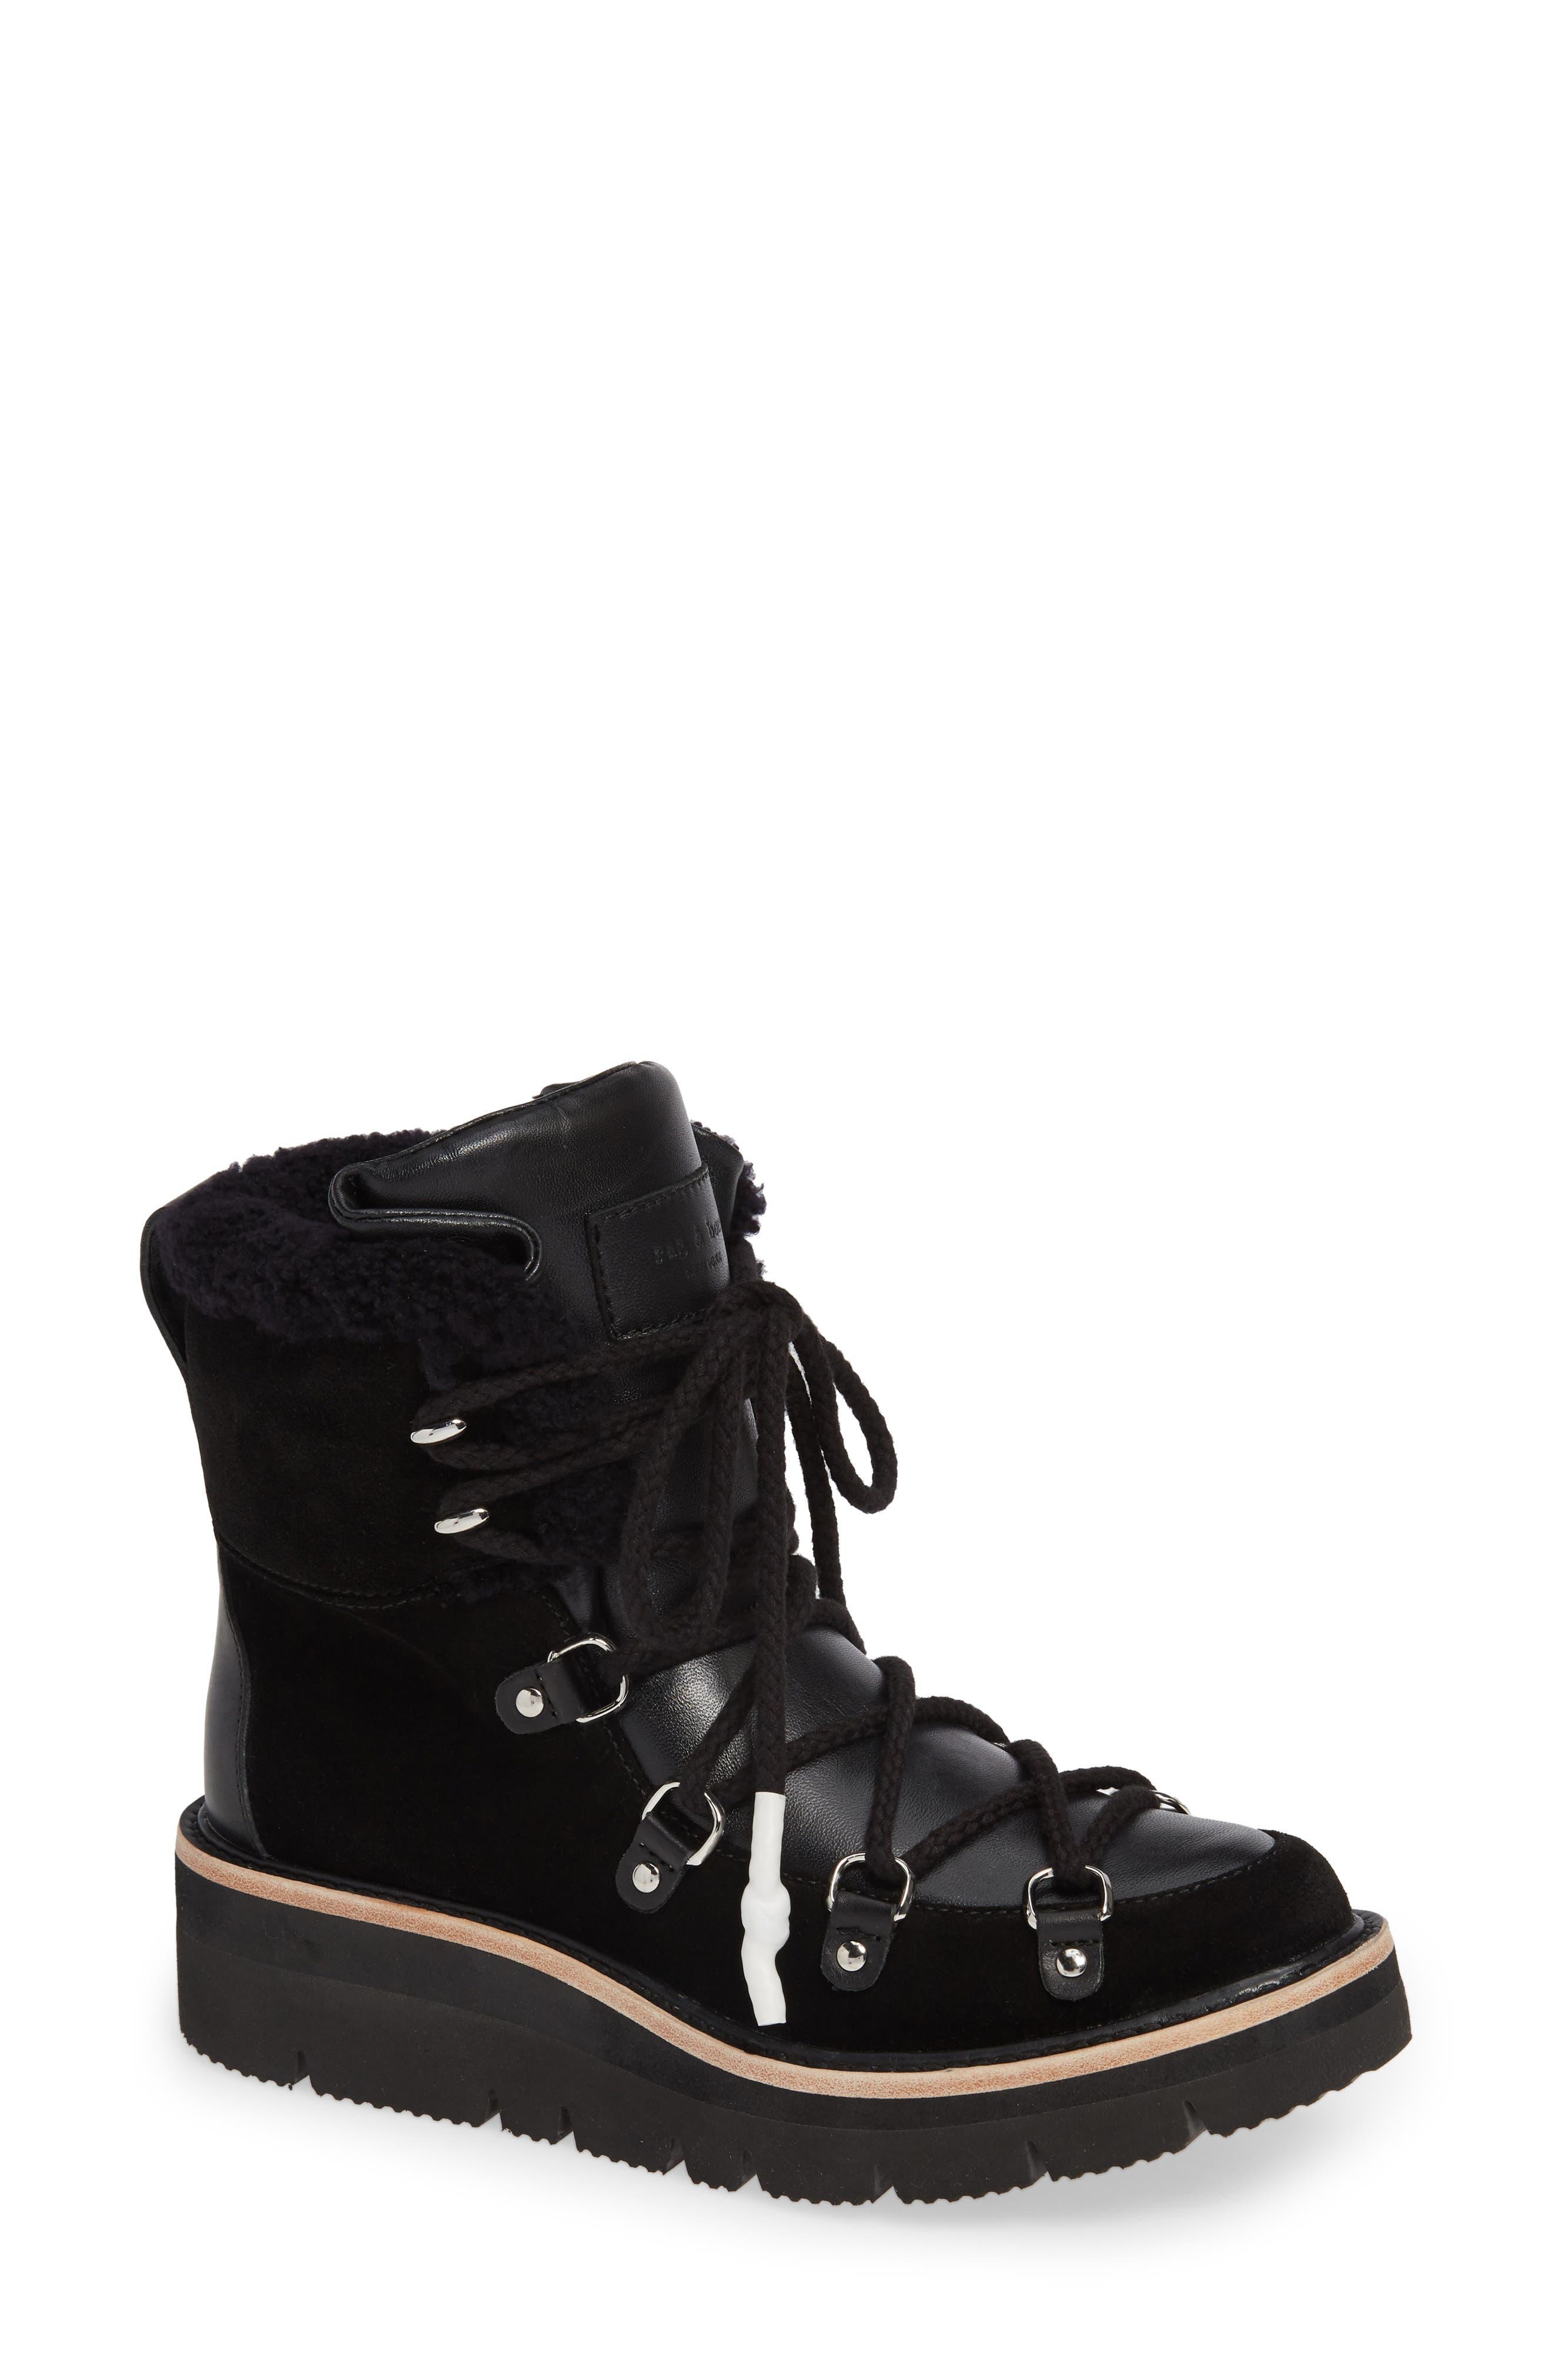 Rag & Bone Skyler Genuine Shearling Lined Boot, Black